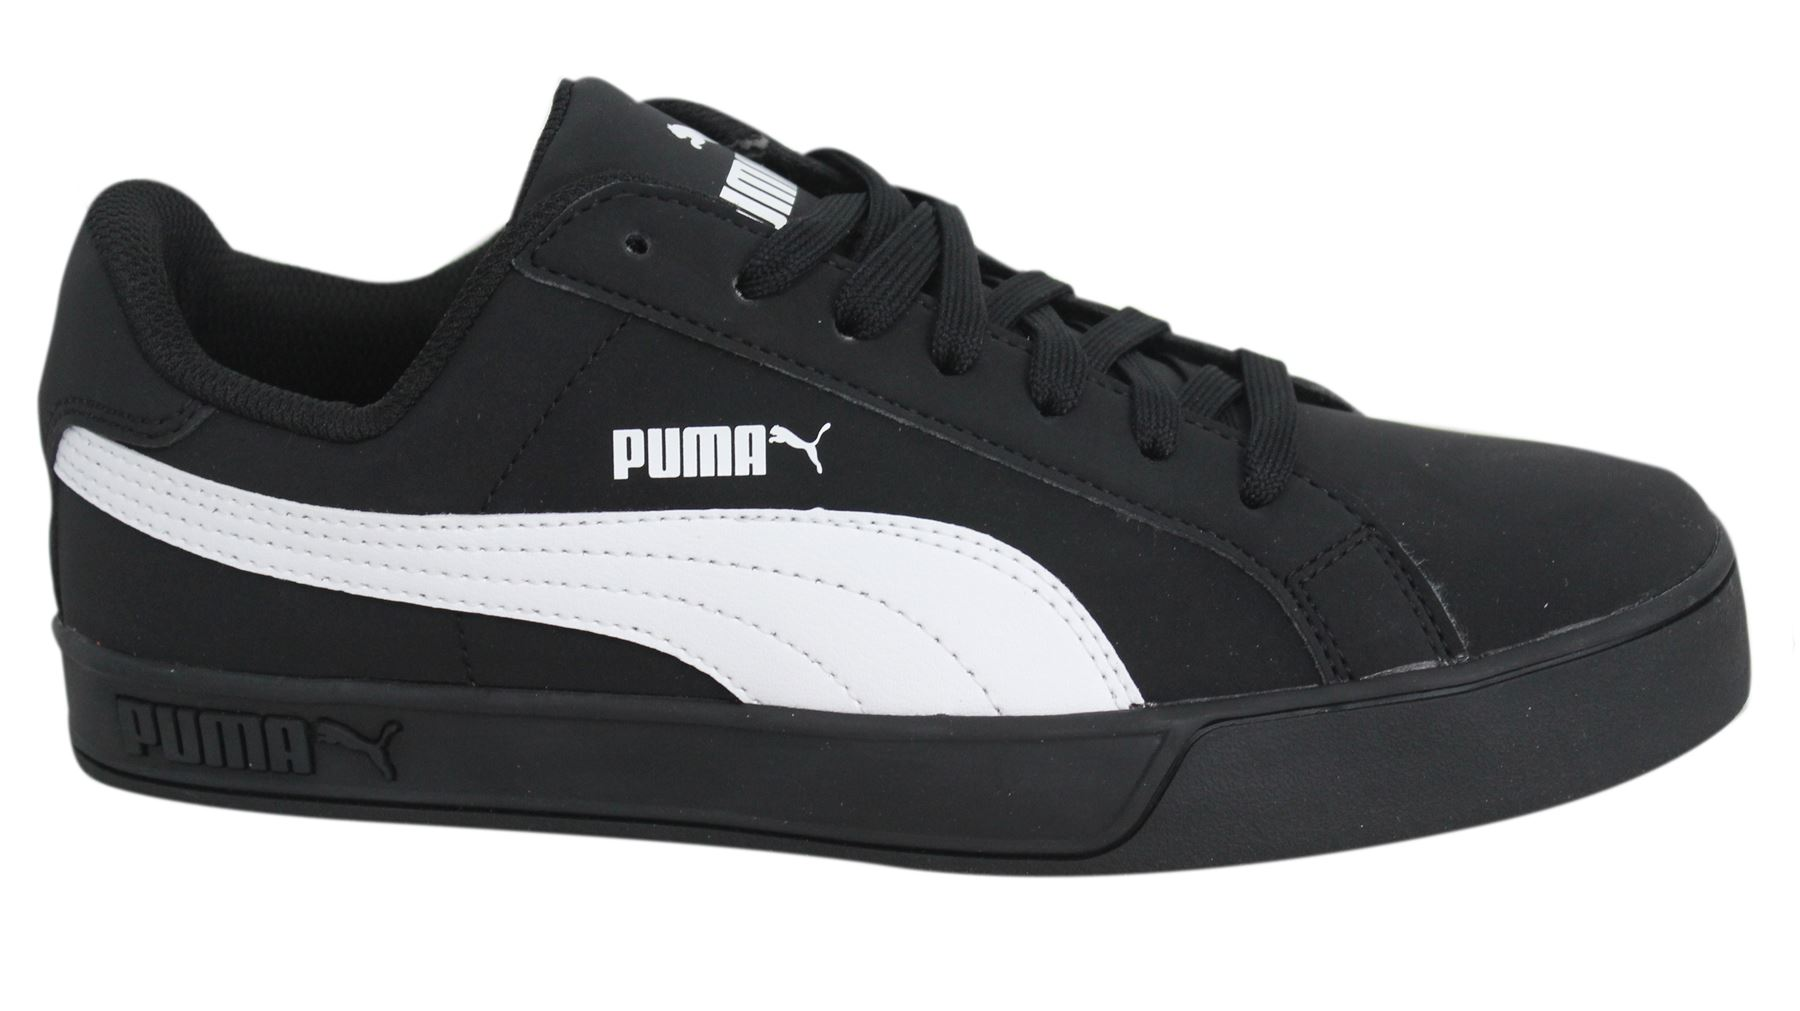 3beae01e87a Puma Smash Vulc Black White Synthetic Lace Up Mens Trainers 359622 14 D71